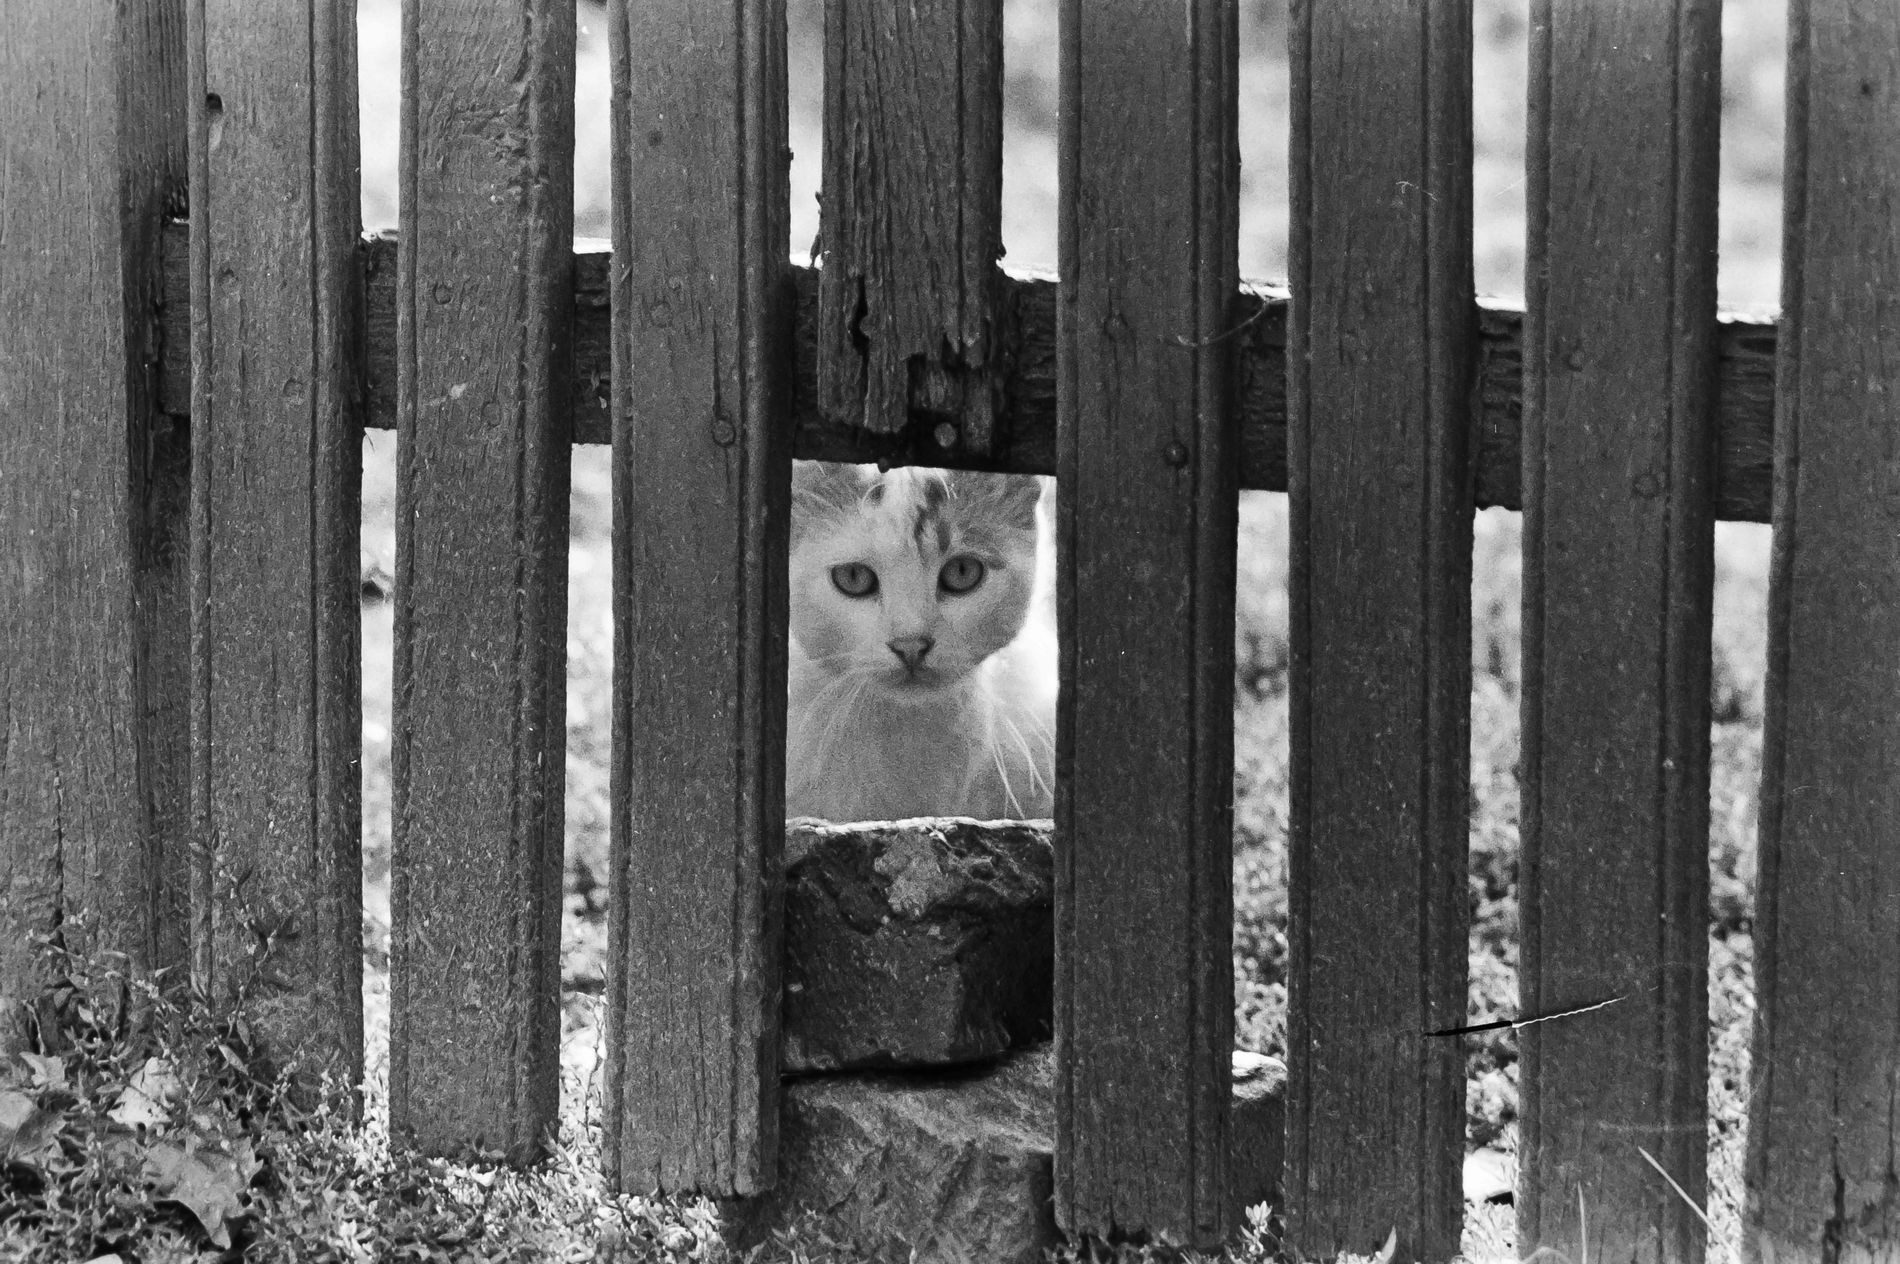 Pisică după gard